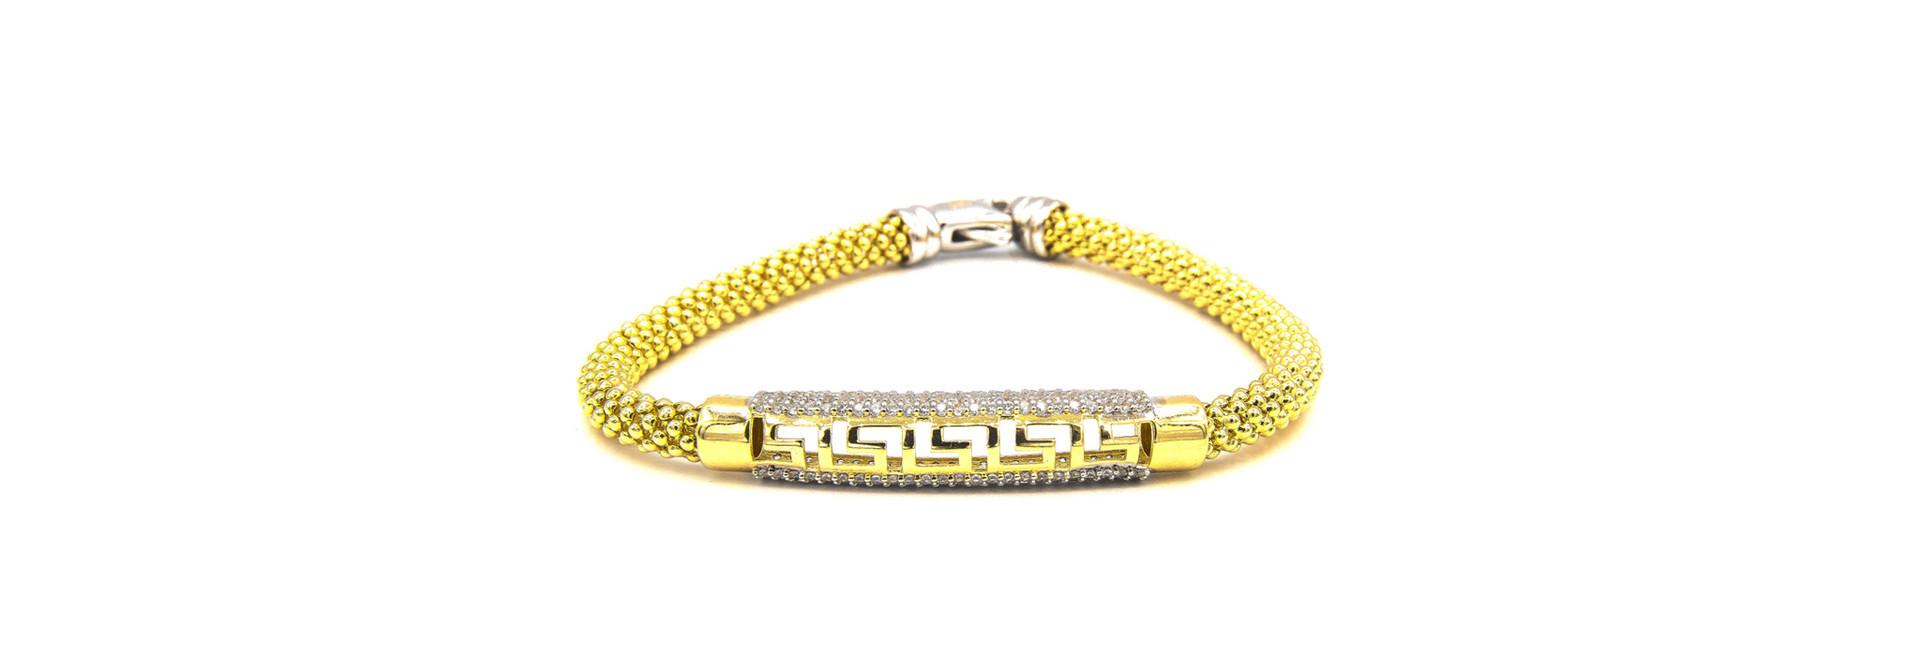 Armband halve slavenband versace met zirkonia's en flexibele boto ketti